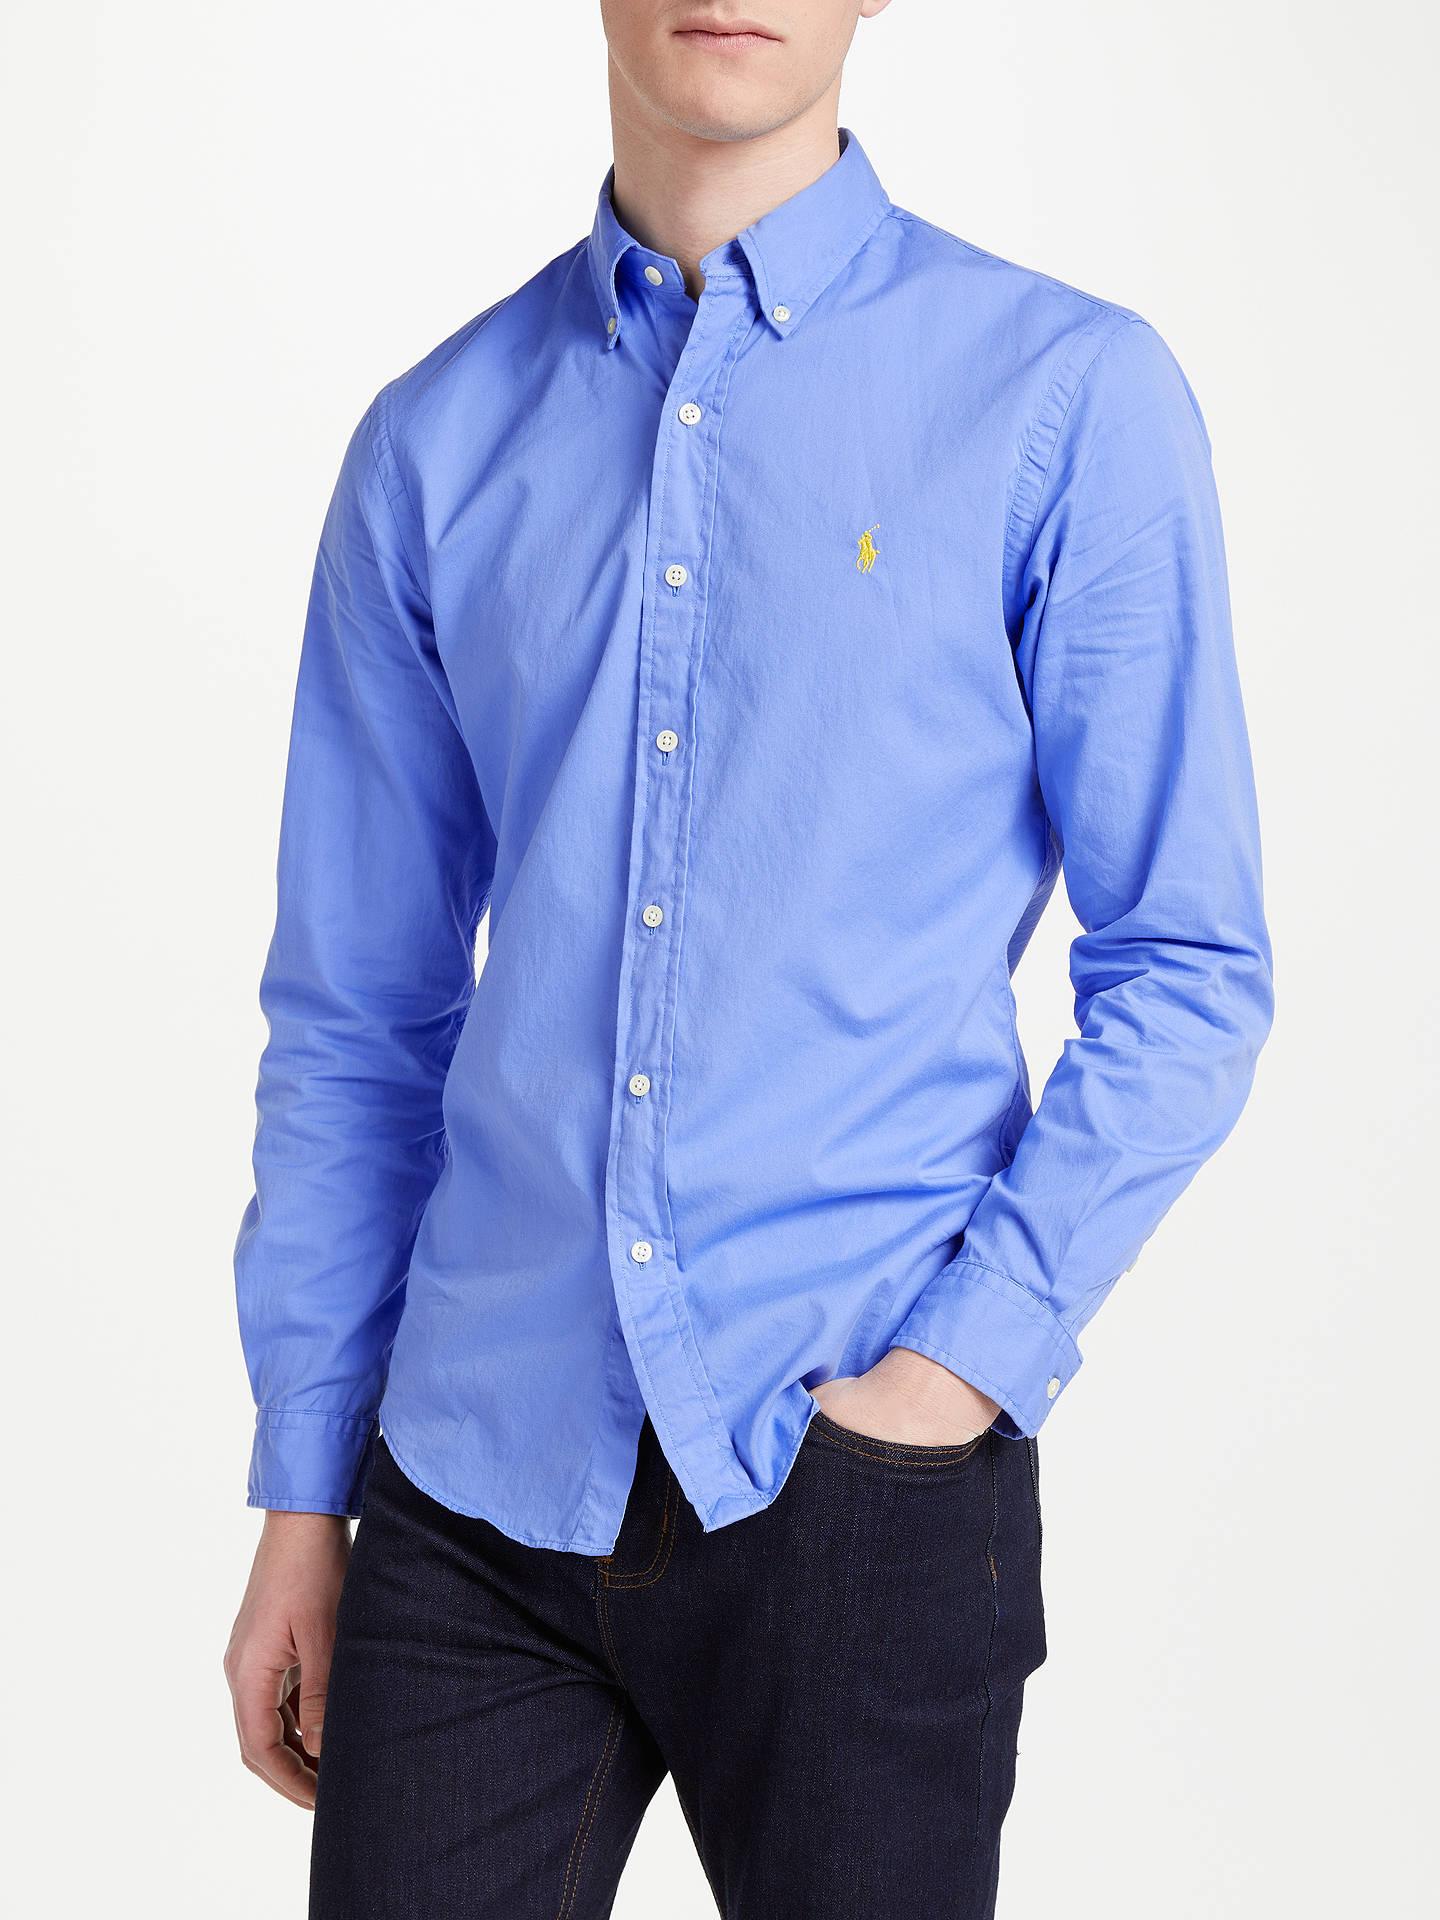 6adc1c3df97 Polo Ralph Lauren Cotton Poplin Shirt at John Lewis   Partners